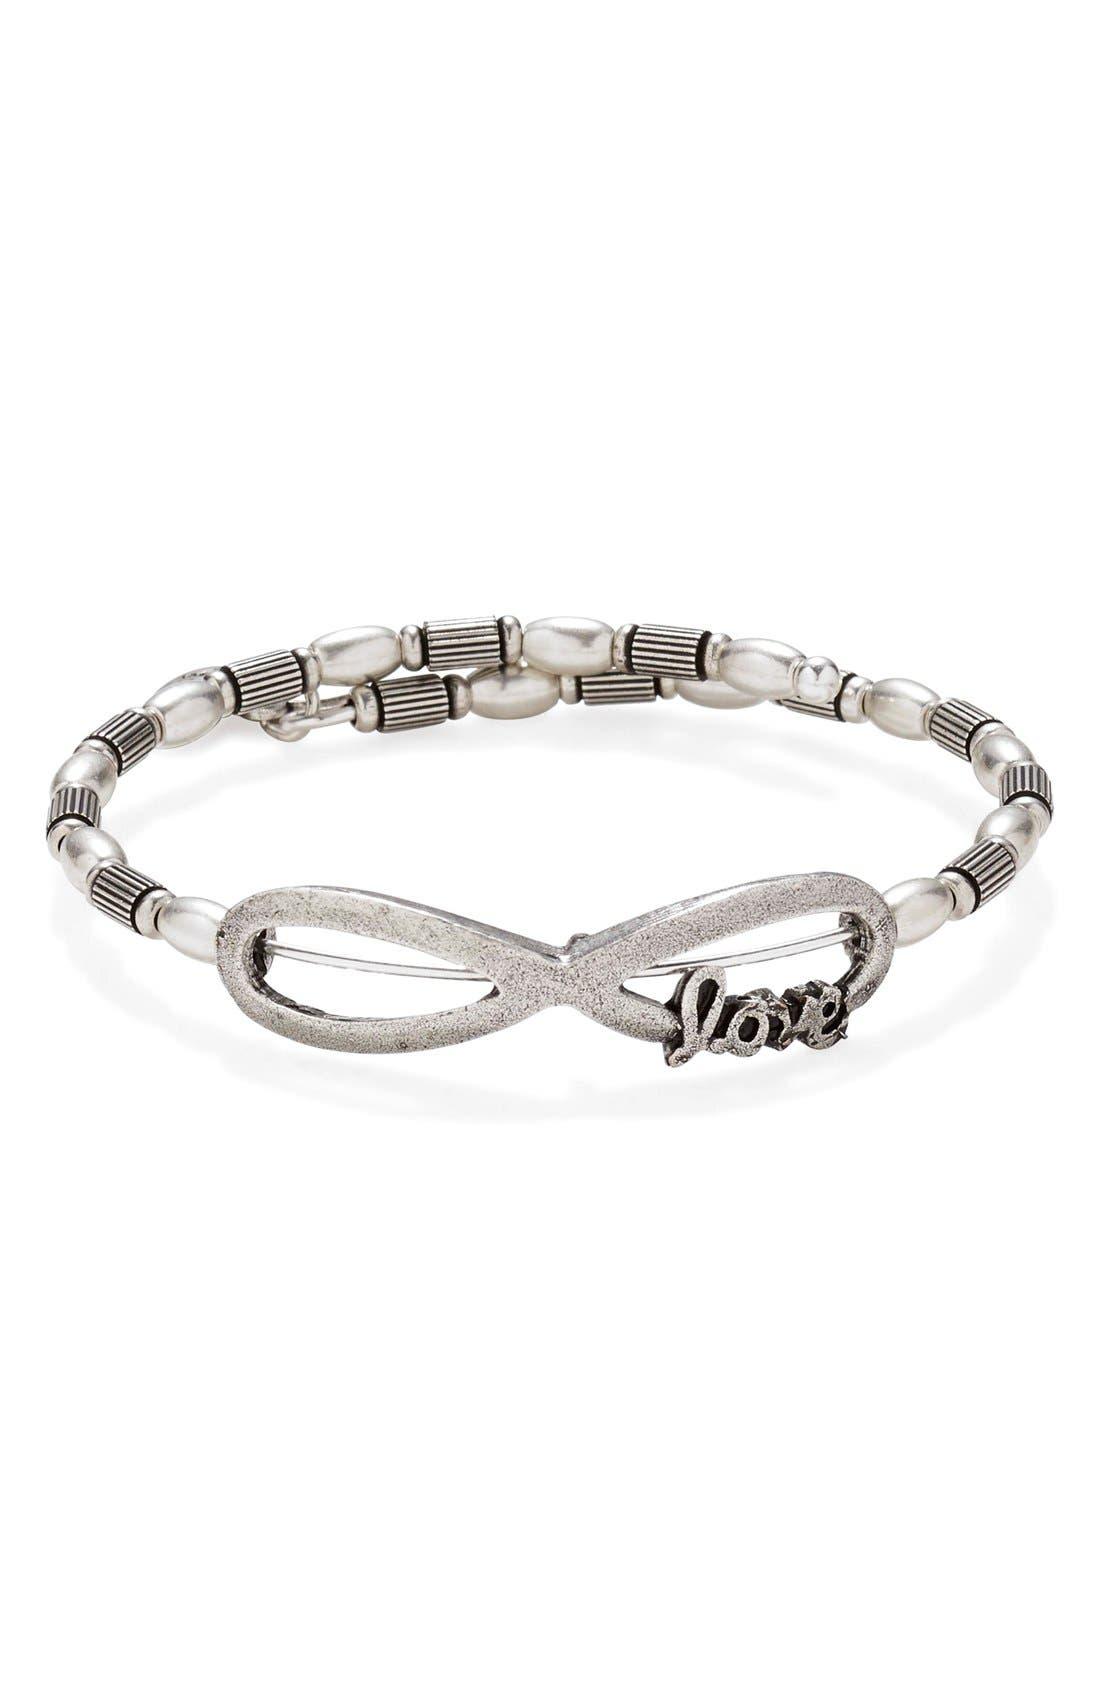 Alternate Image 1 Selected - Alex and Ani 'Infinite Love' Wrap Bracelet